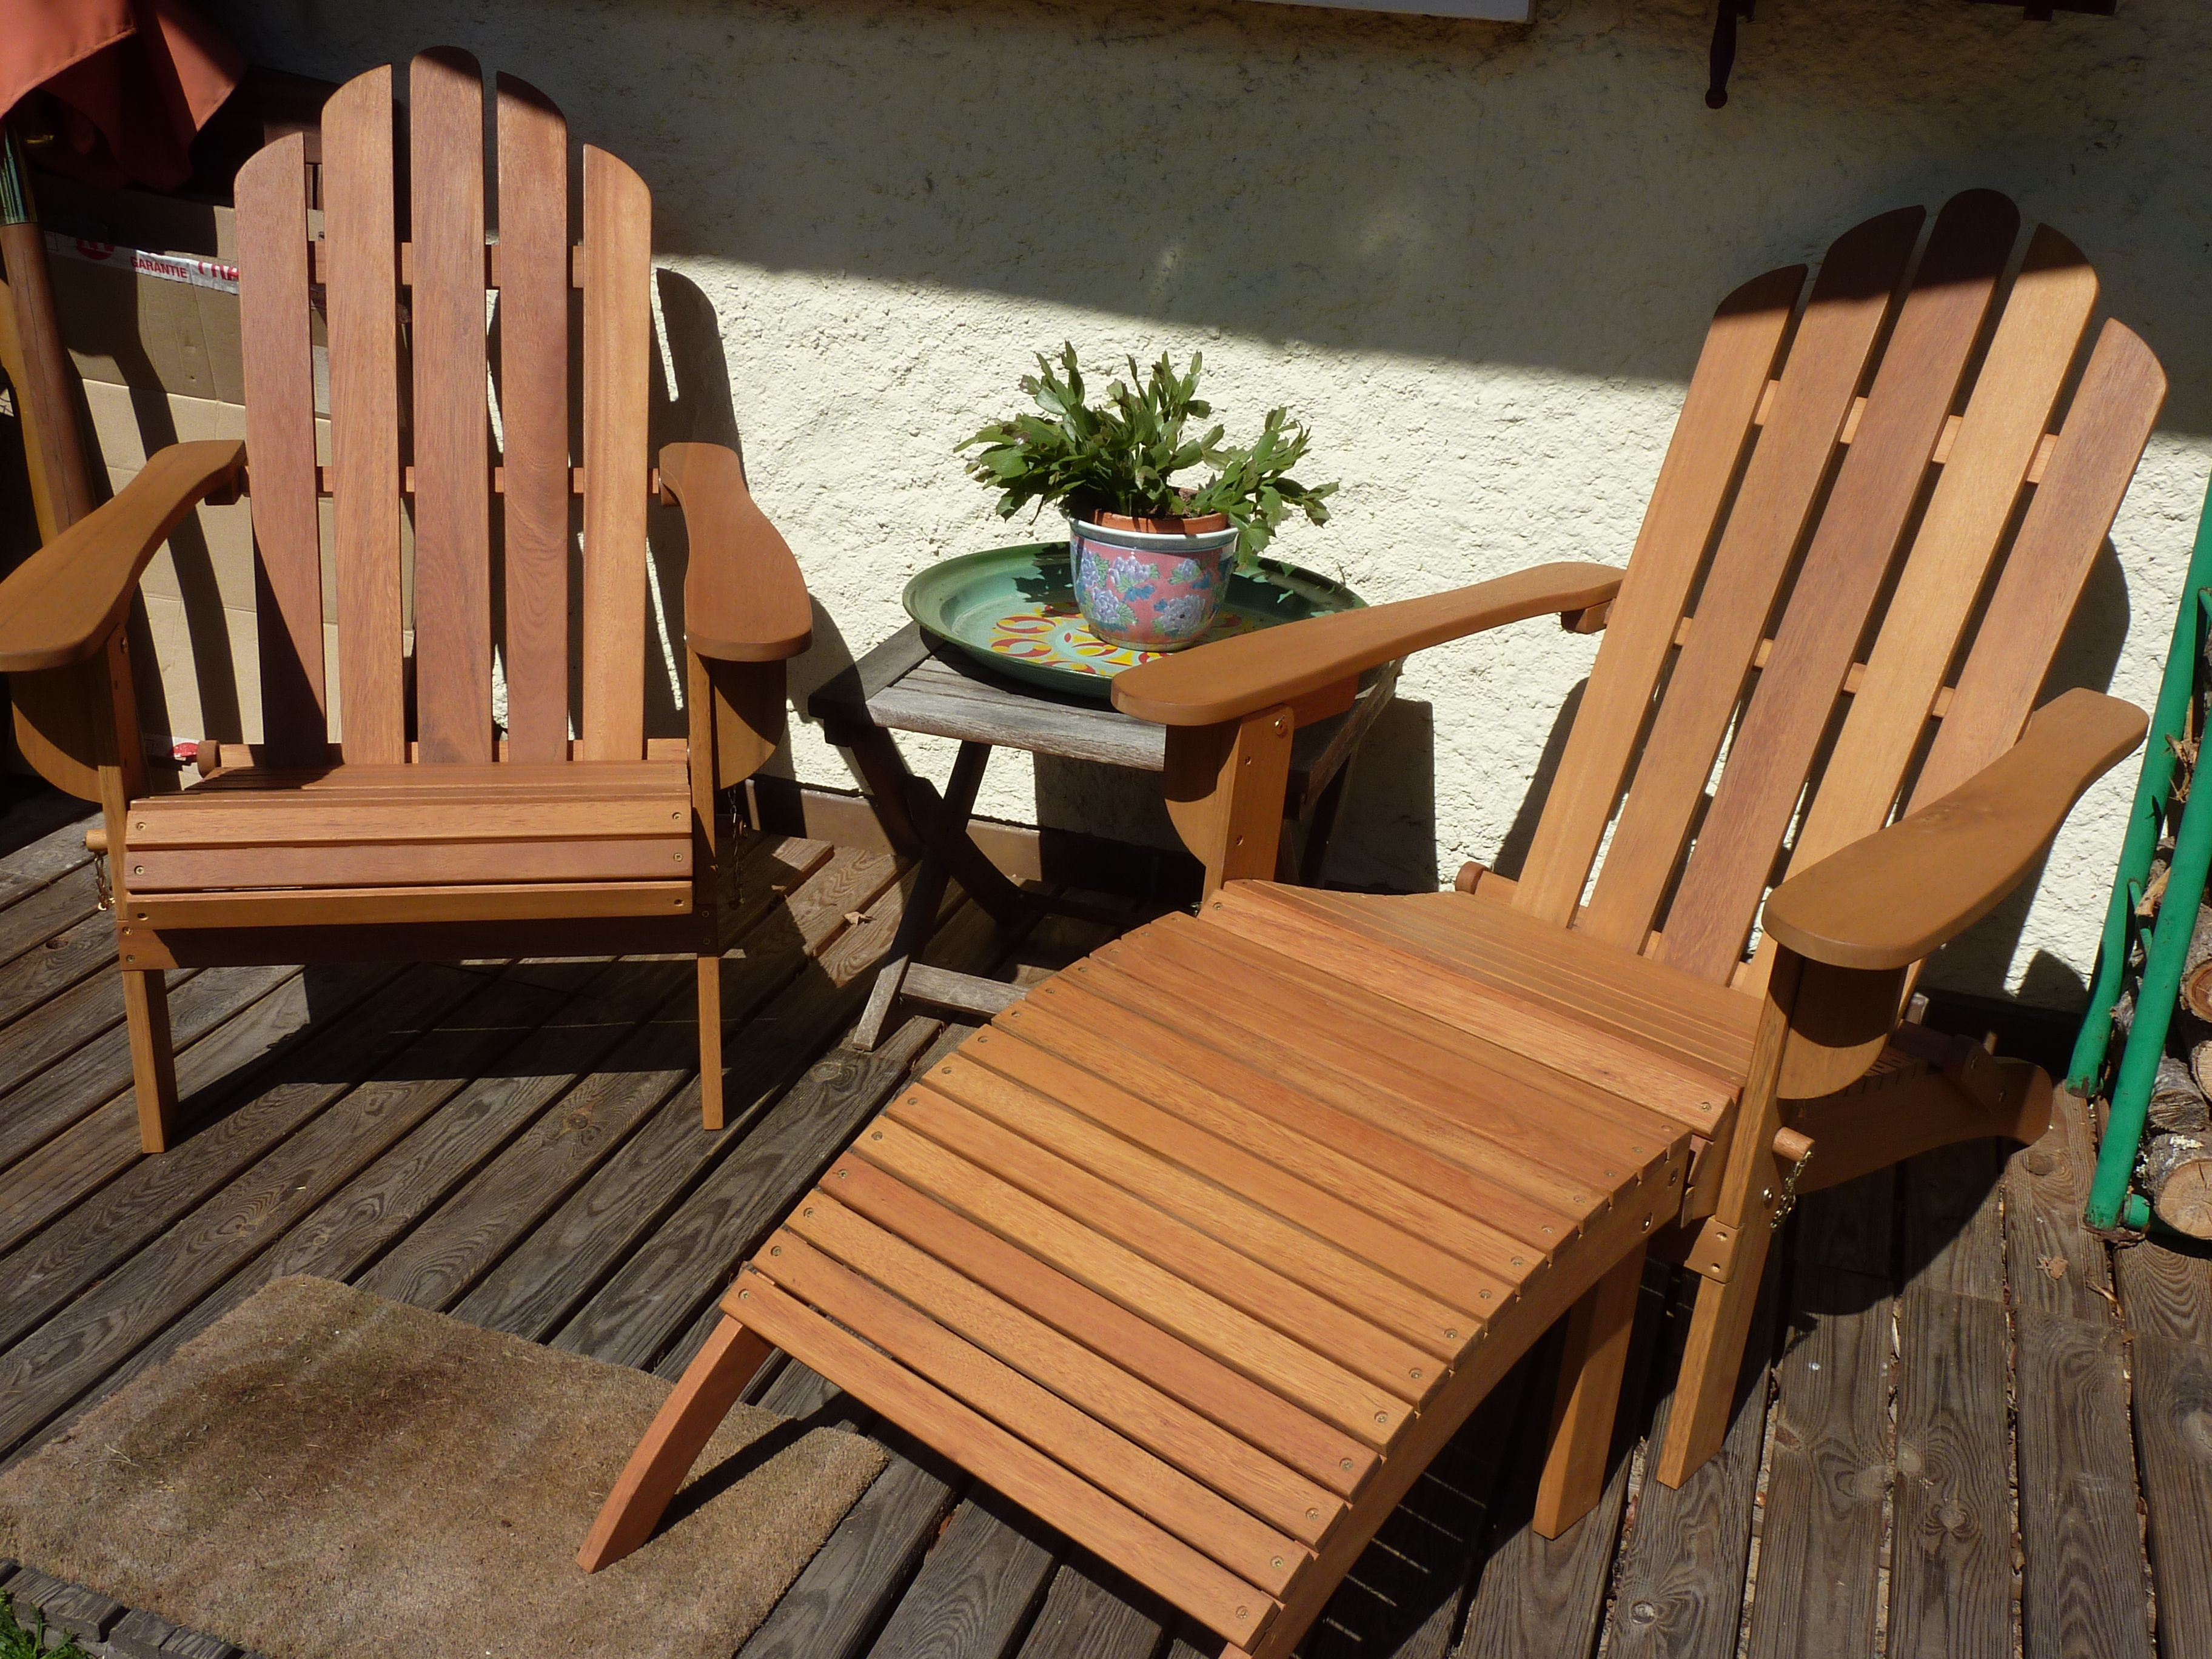 Adirondack fauteuil de jardin en bois eucalyptus FSC style rétro